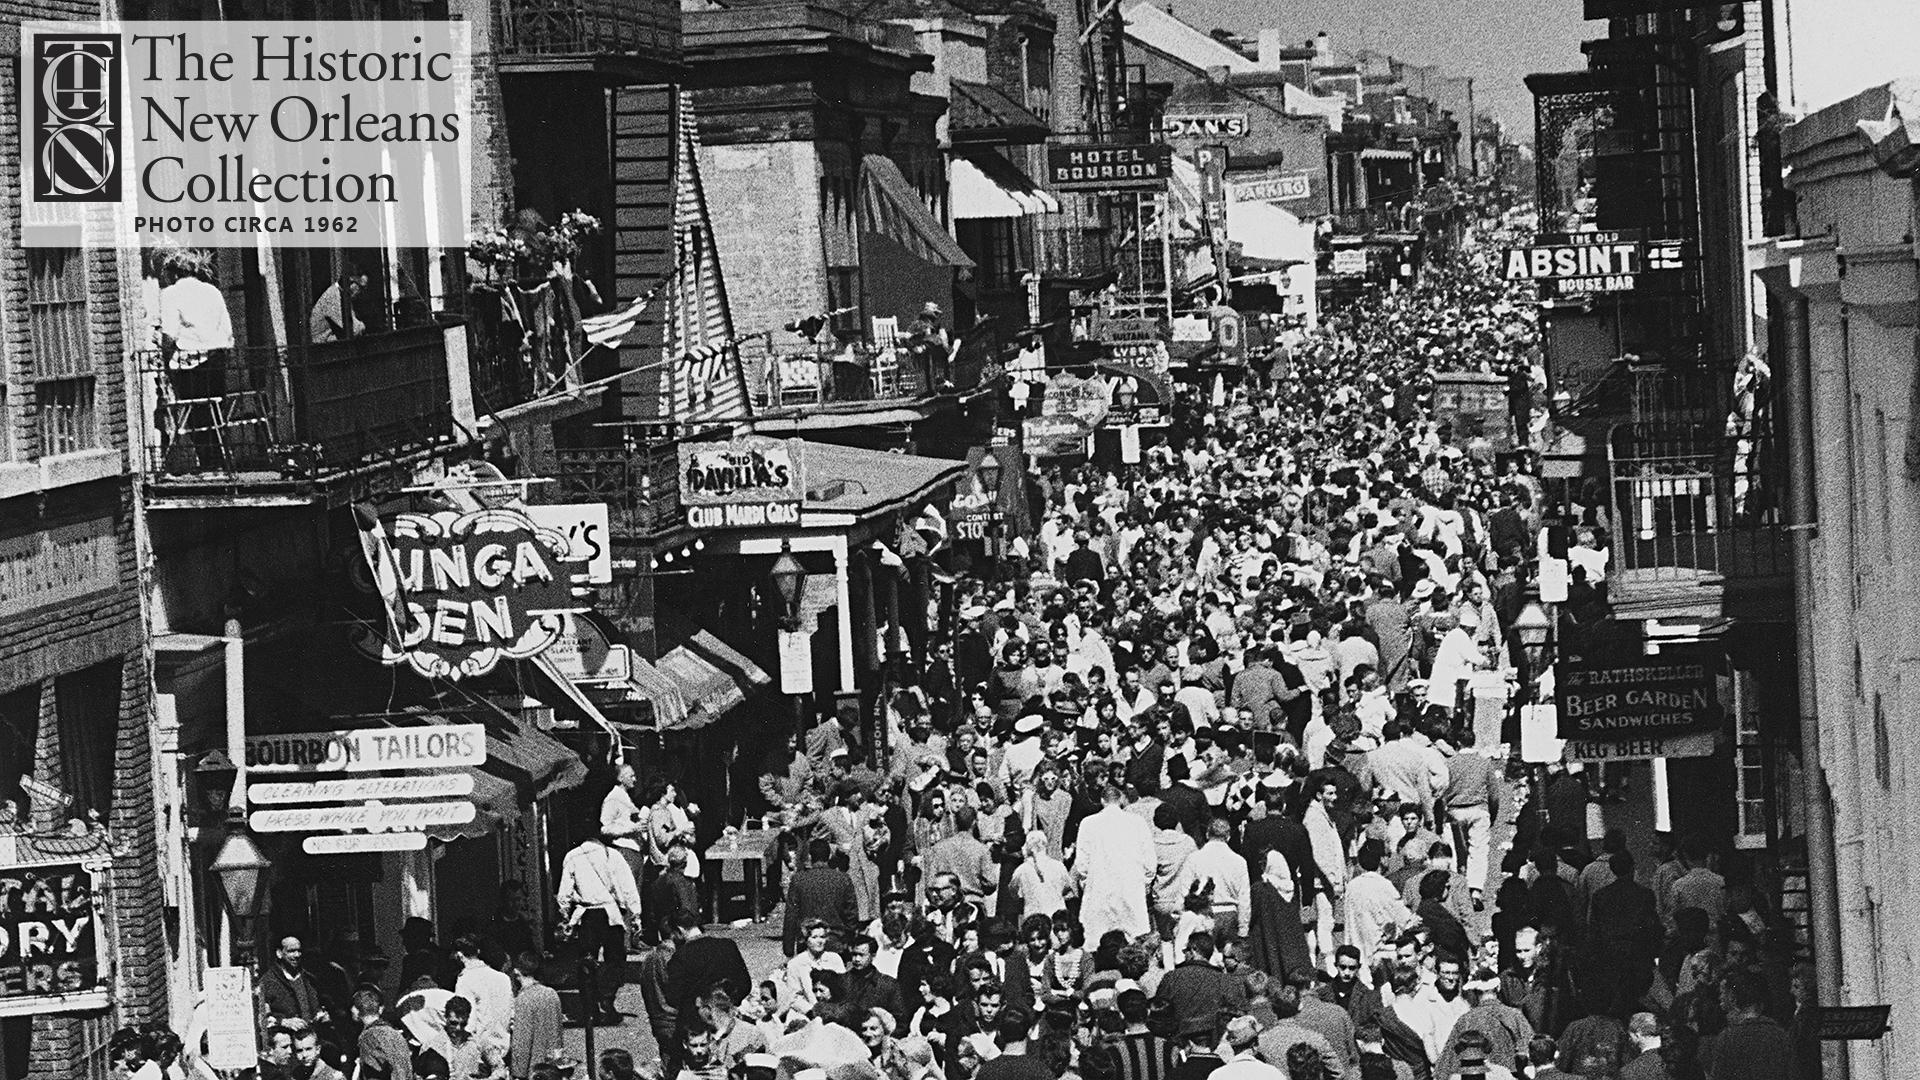 Bourbon Street crowd scene